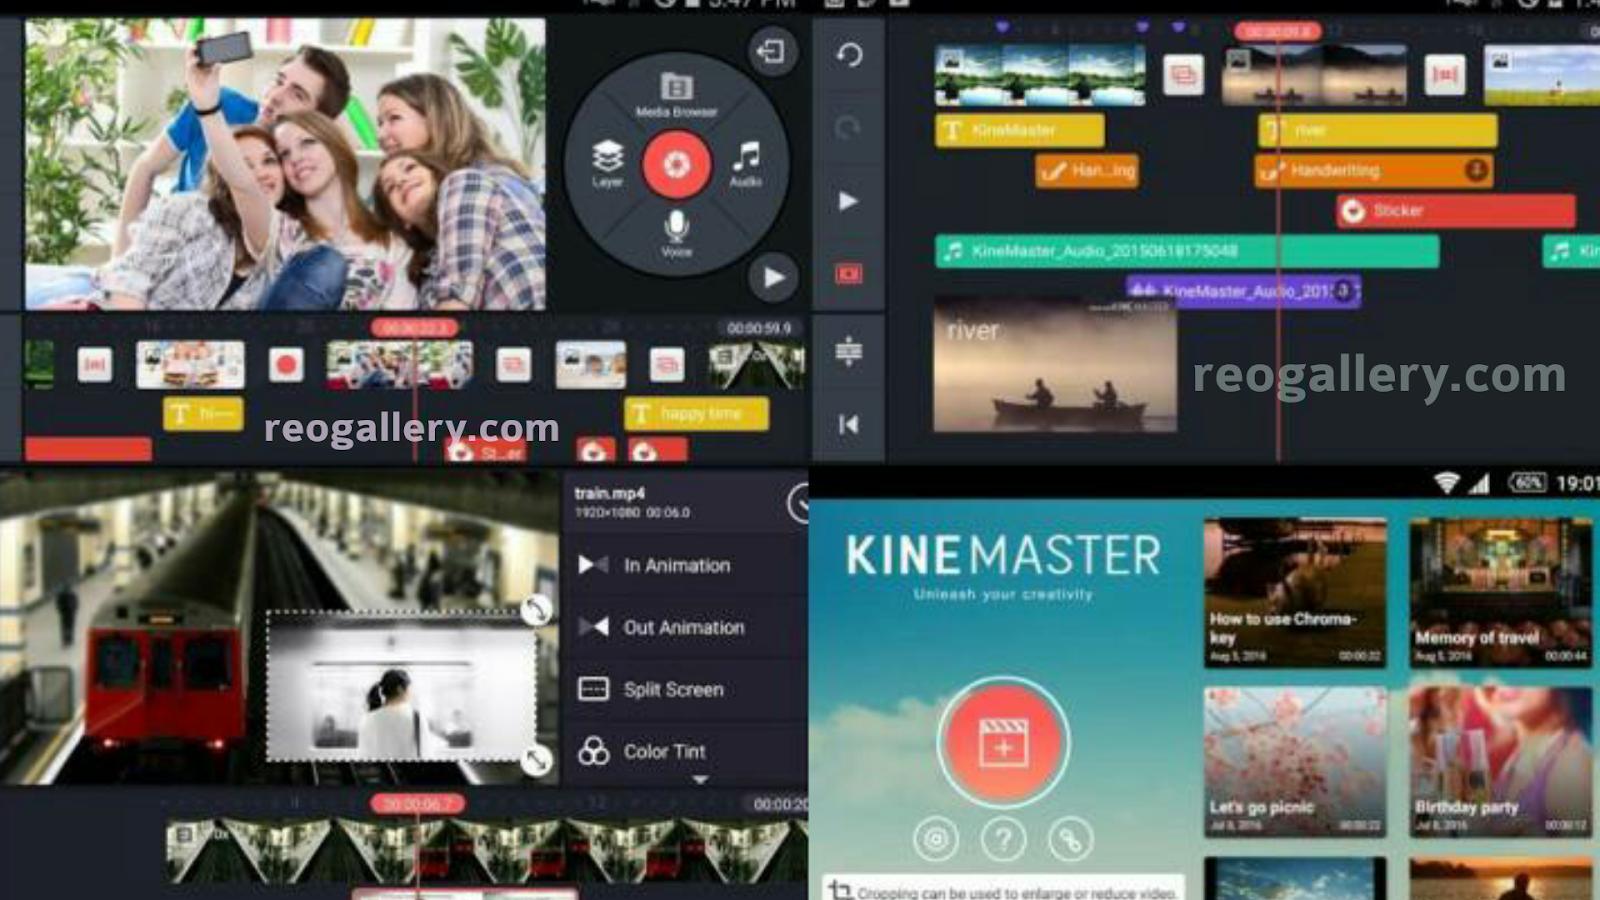 How to download kinemaster mod apk - No watermark, chroma key